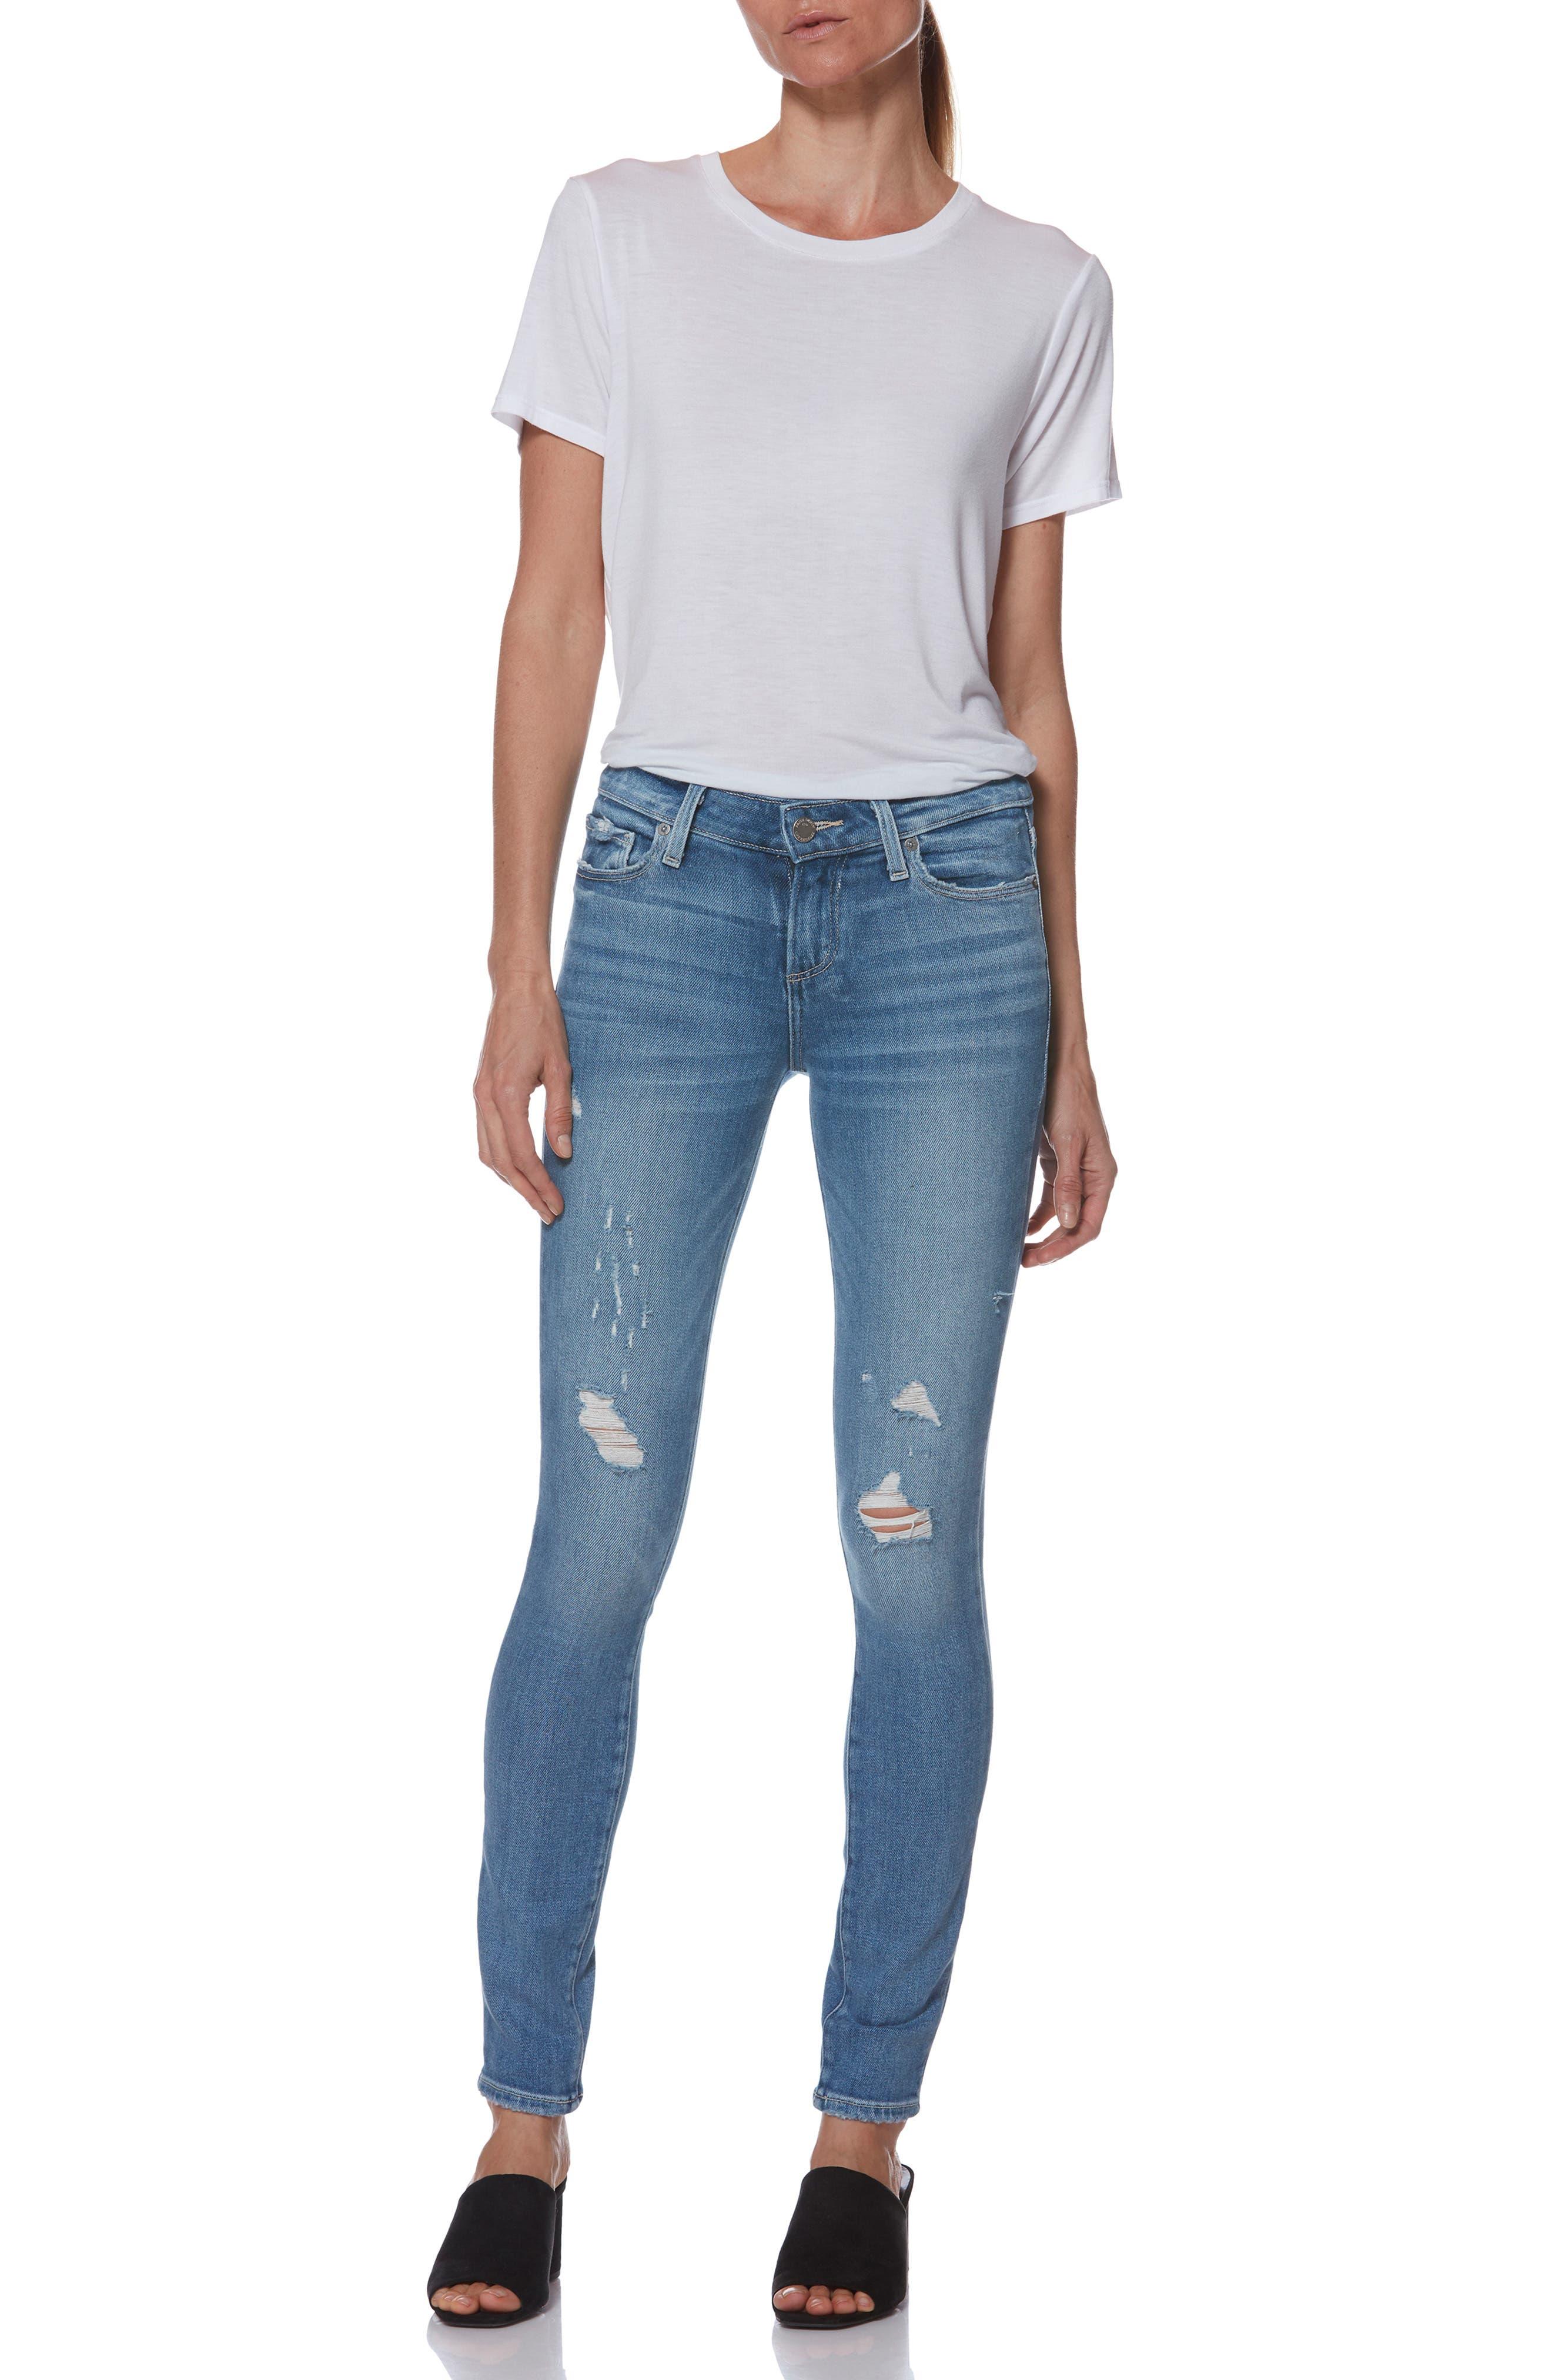 PAIGE,                             Verdugo Ultra Skinny Jeans,                             Alternate thumbnail 9, color,                             KAYSON DISTRESSED